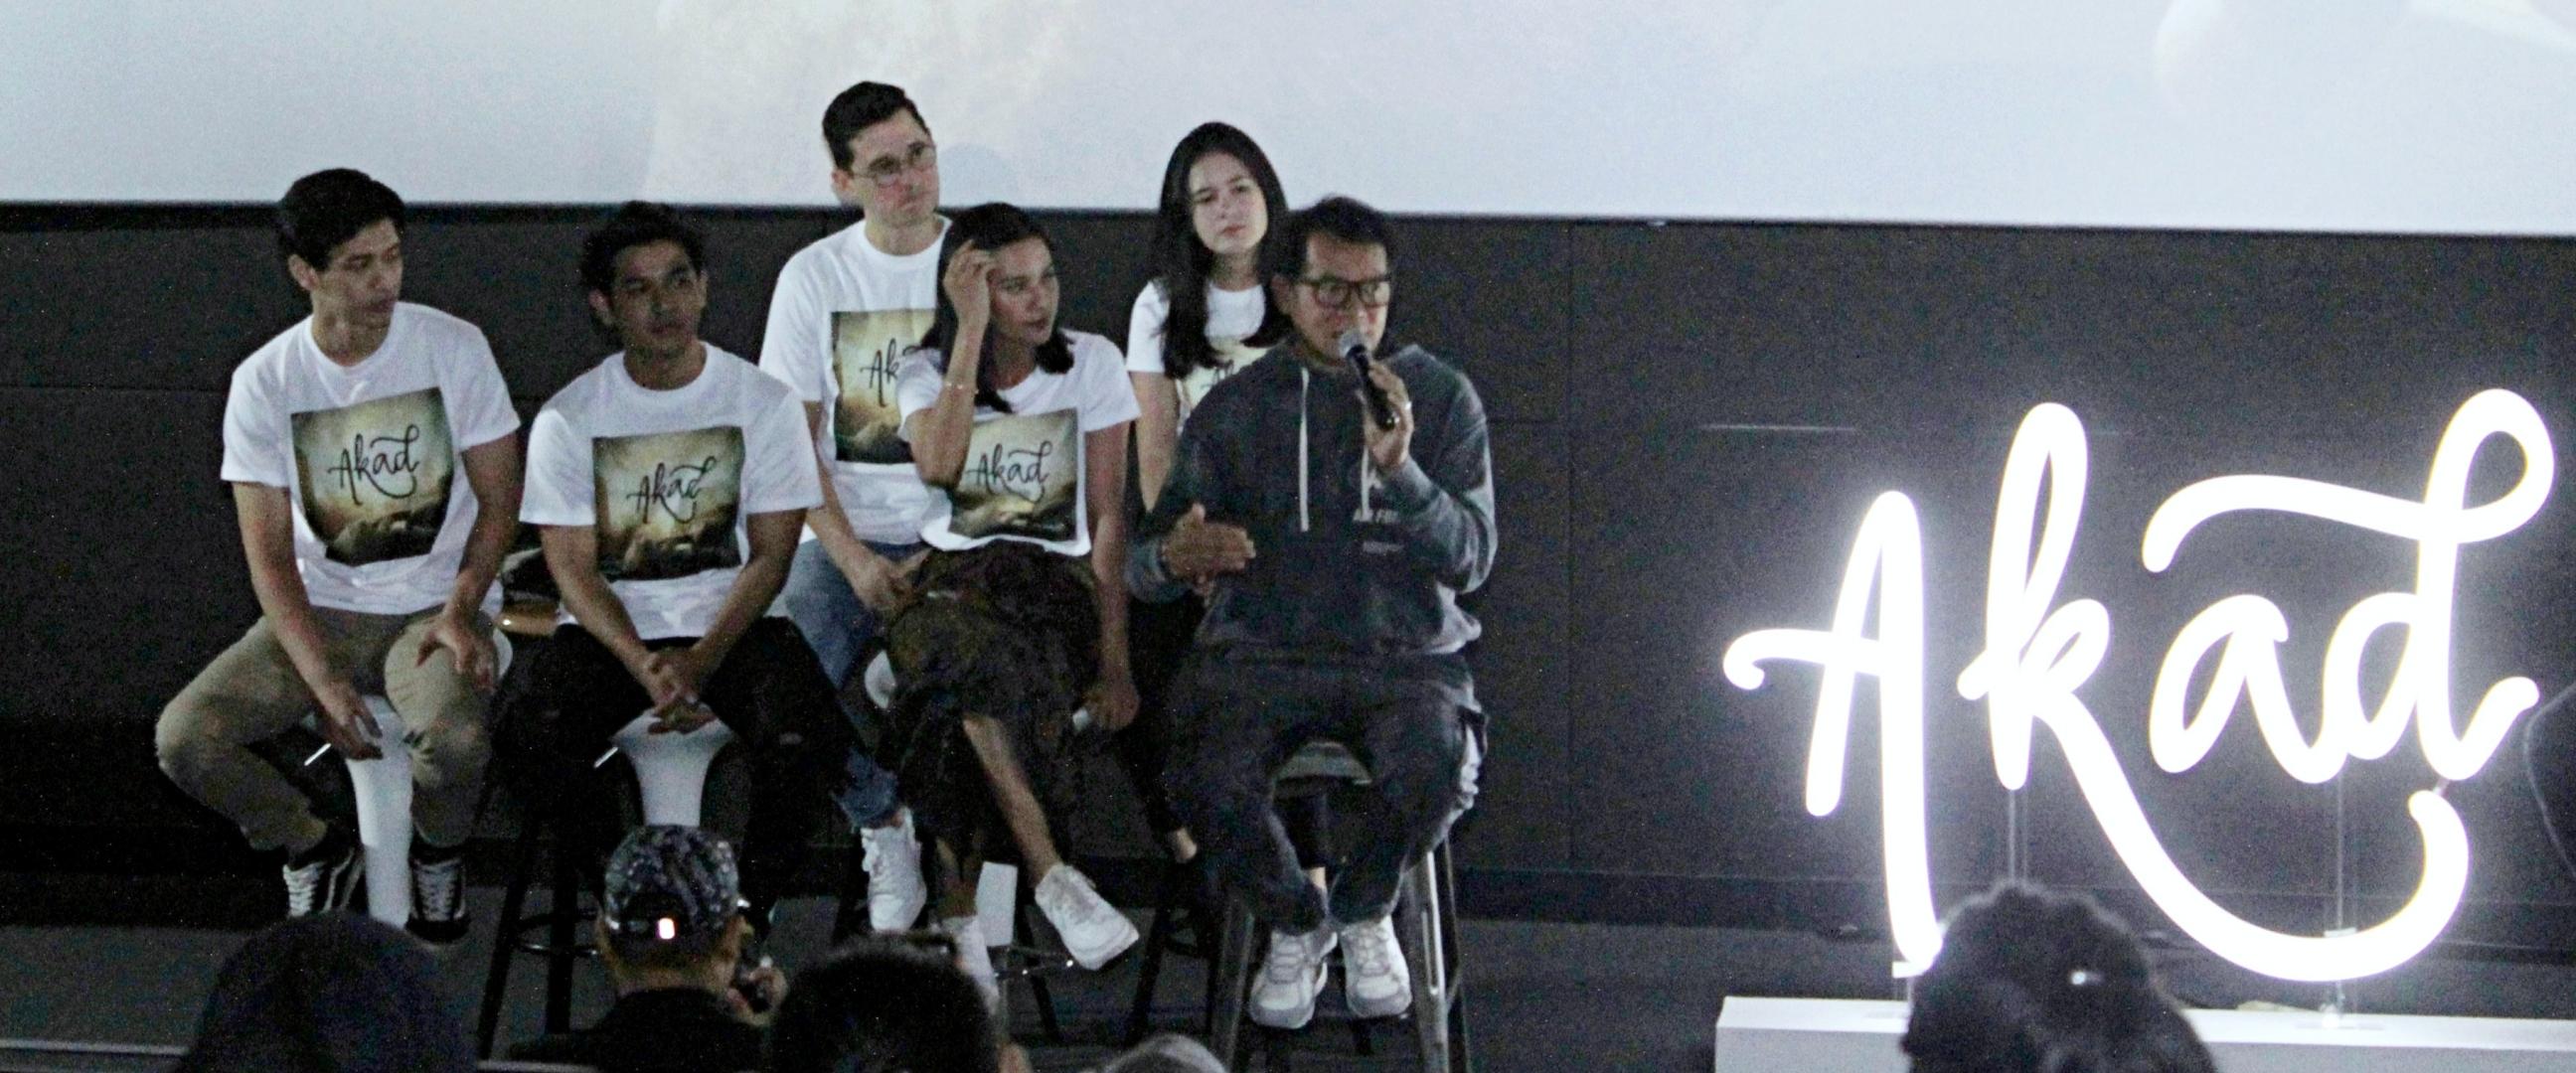 6 Fakta film Akad yang diadaptasi dari lagu Payung Teduh